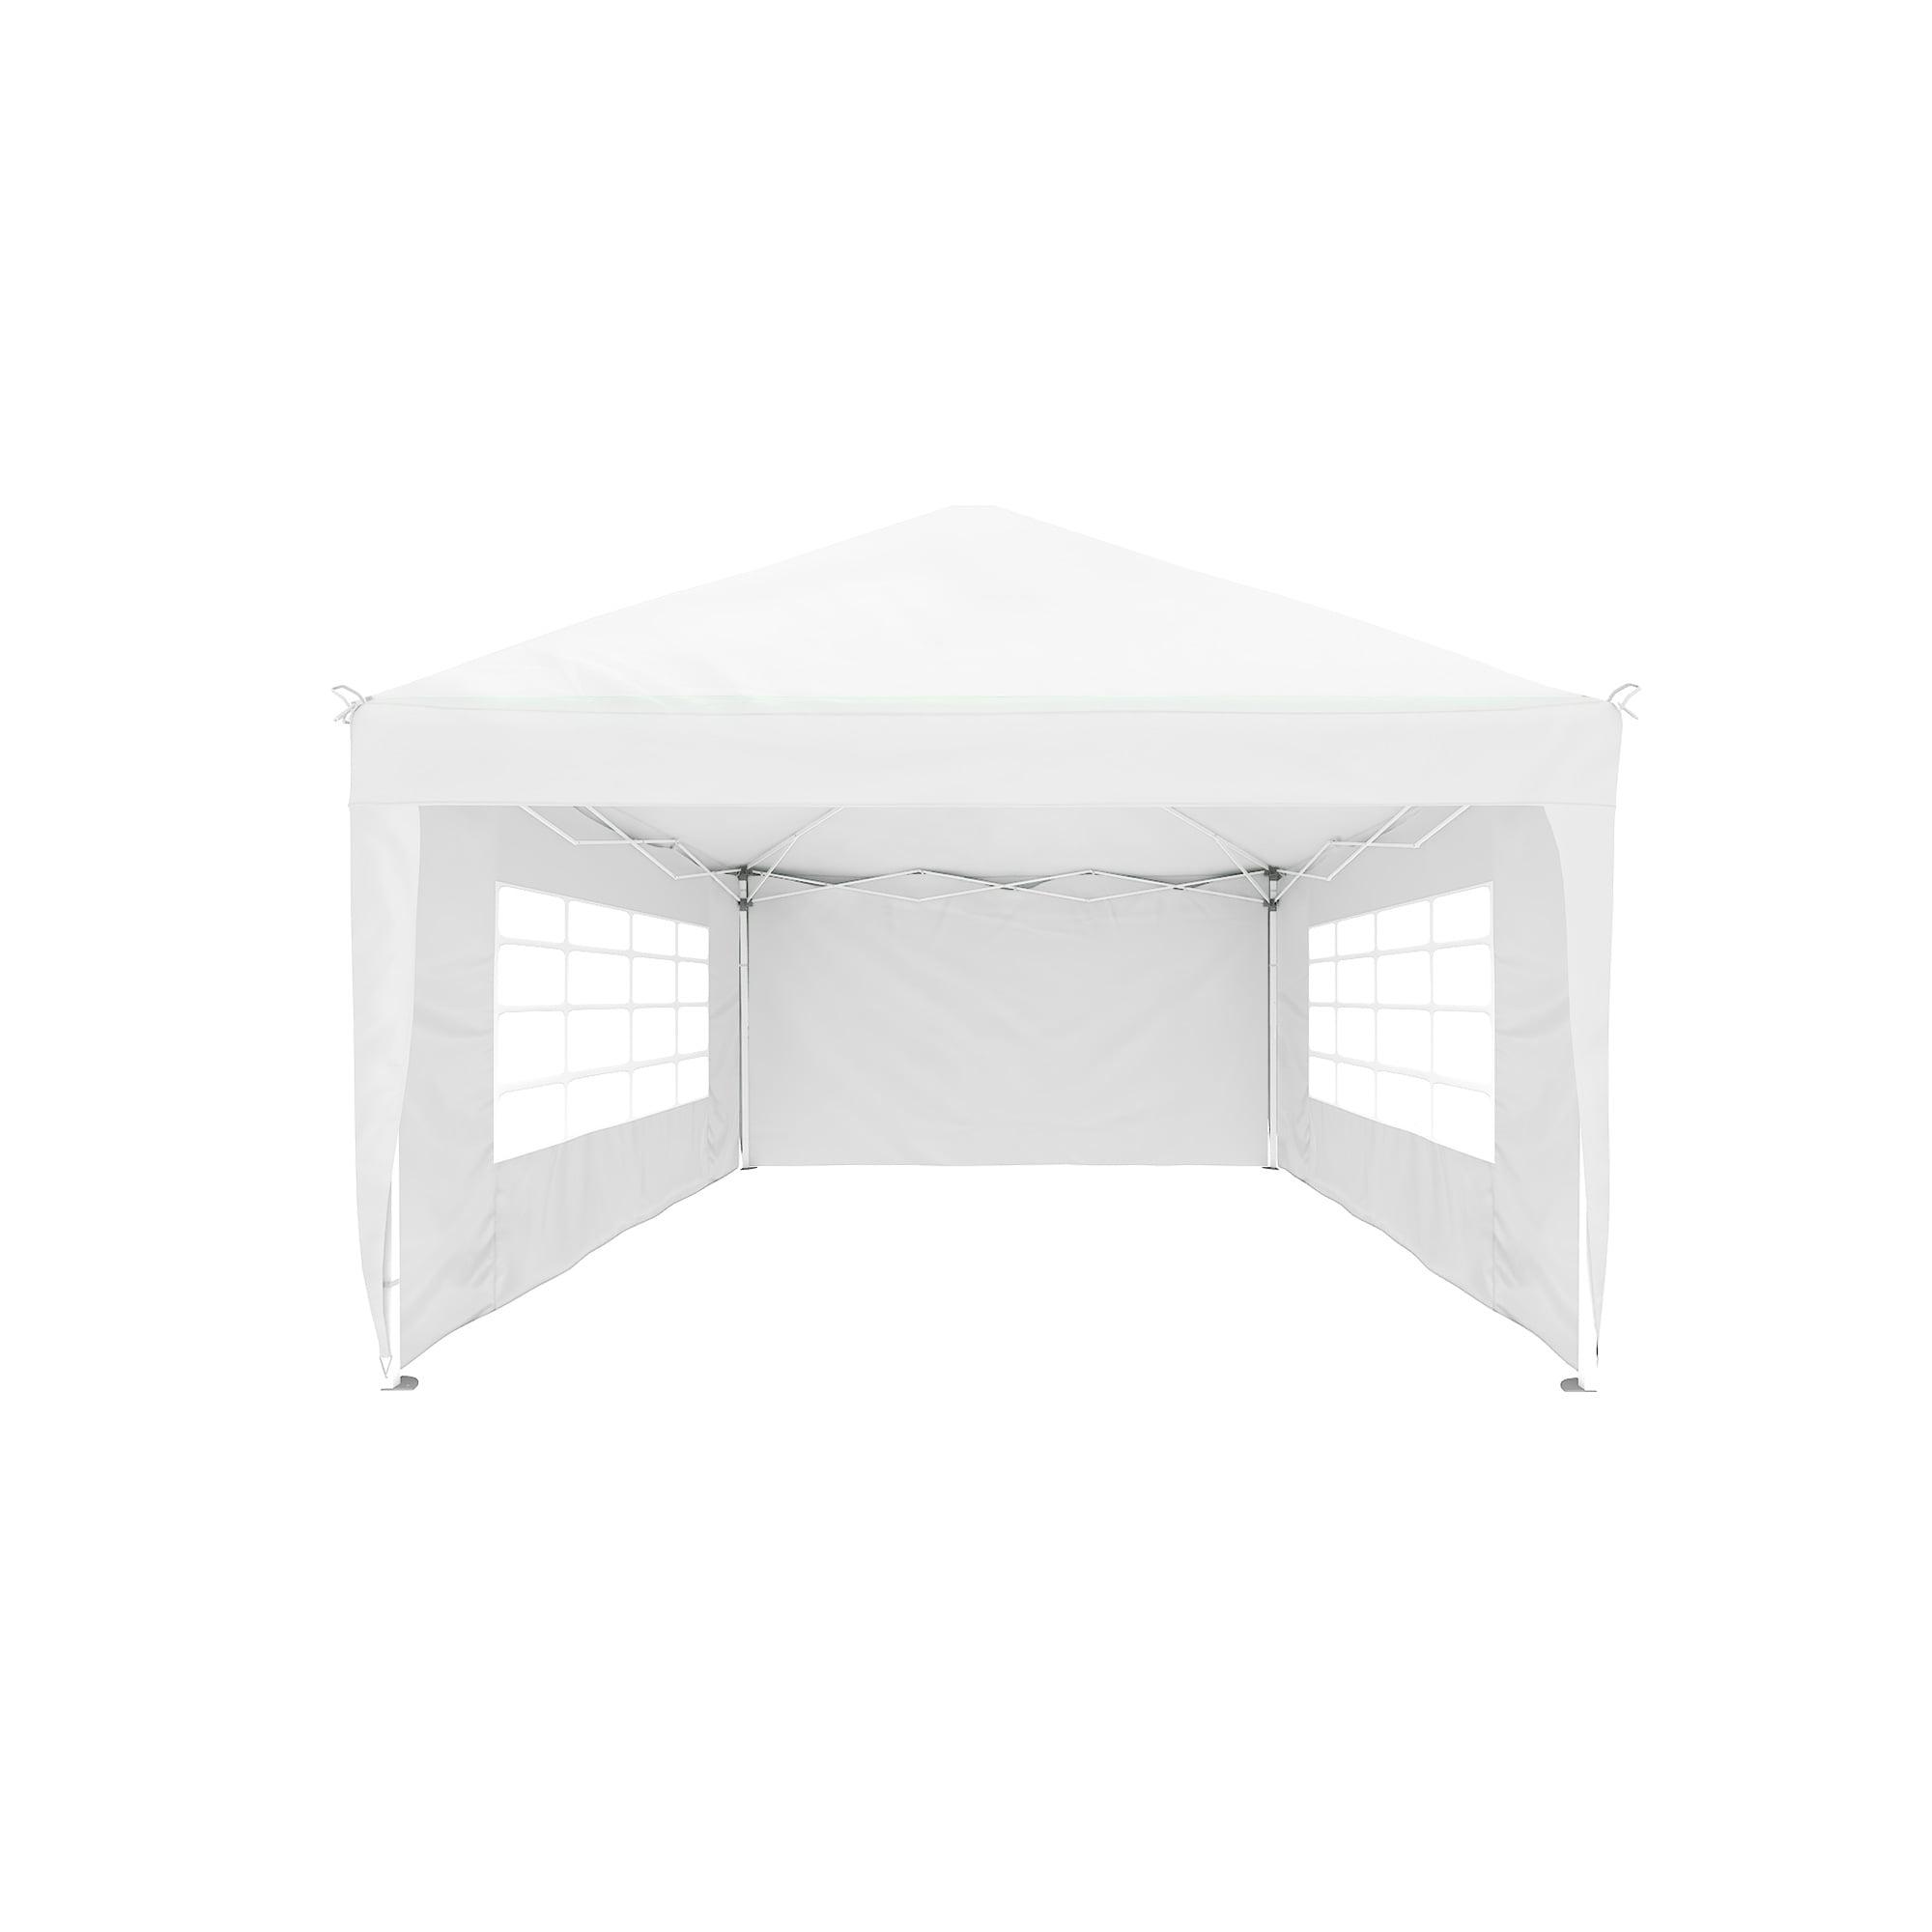 klapp falt pavillon wasserdicht weiss 3x3m premiumstoff. Black Bedroom Furniture Sets. Home Design Ideas